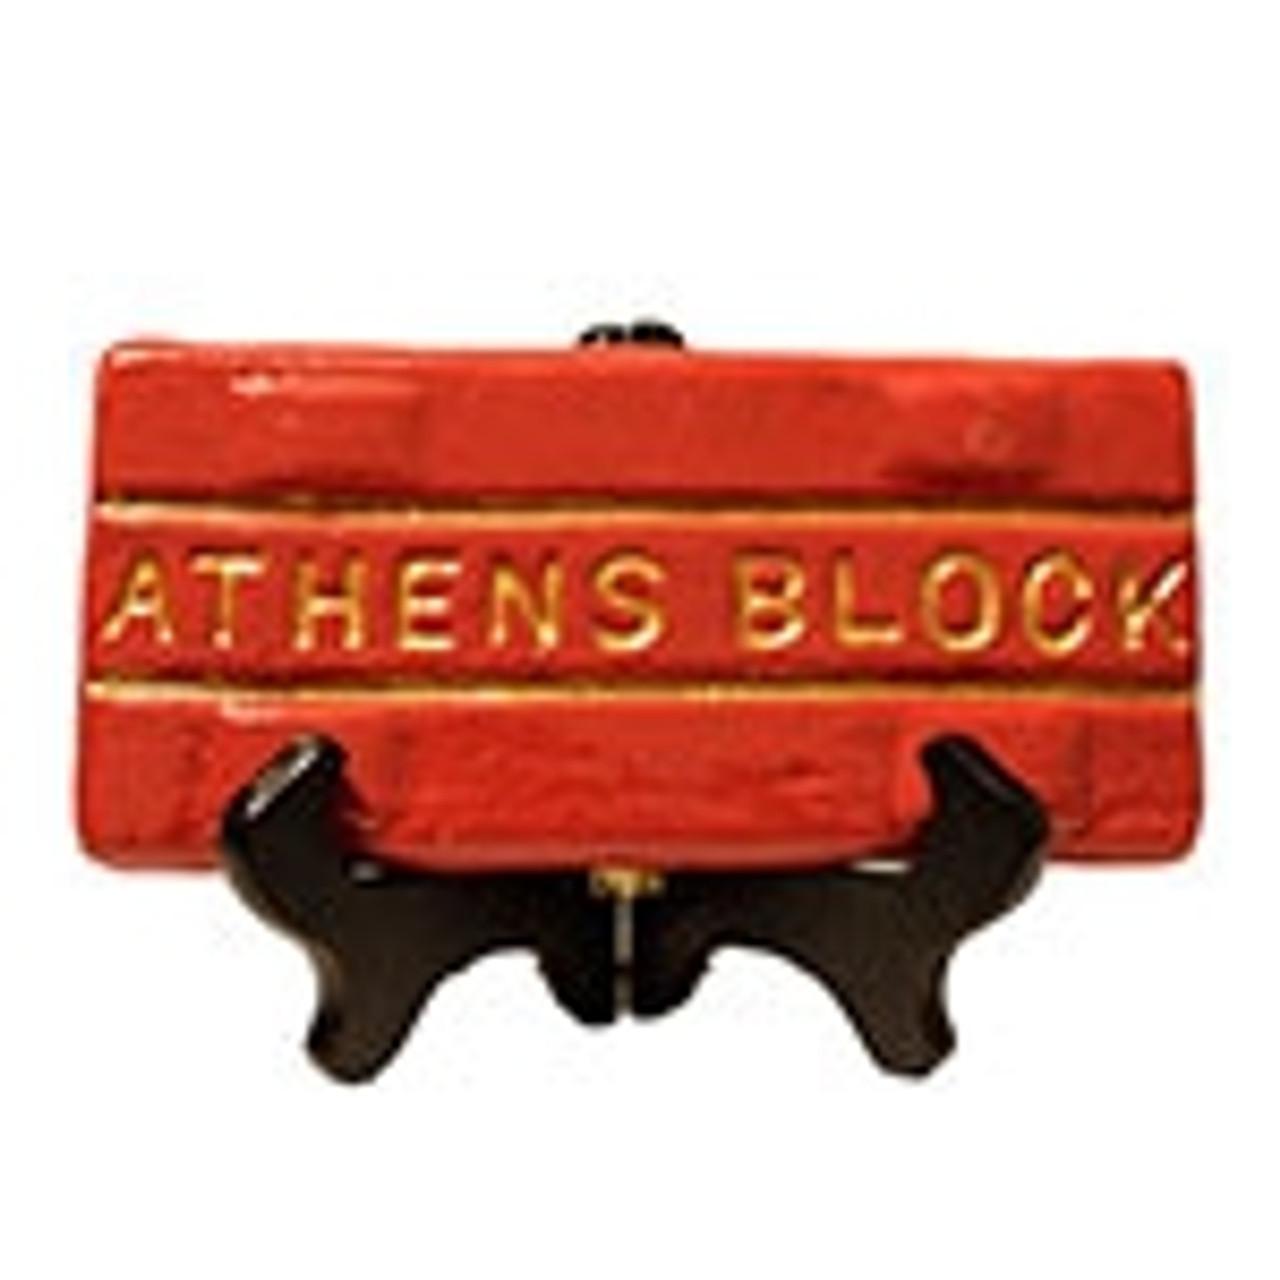 Athens Block Studio